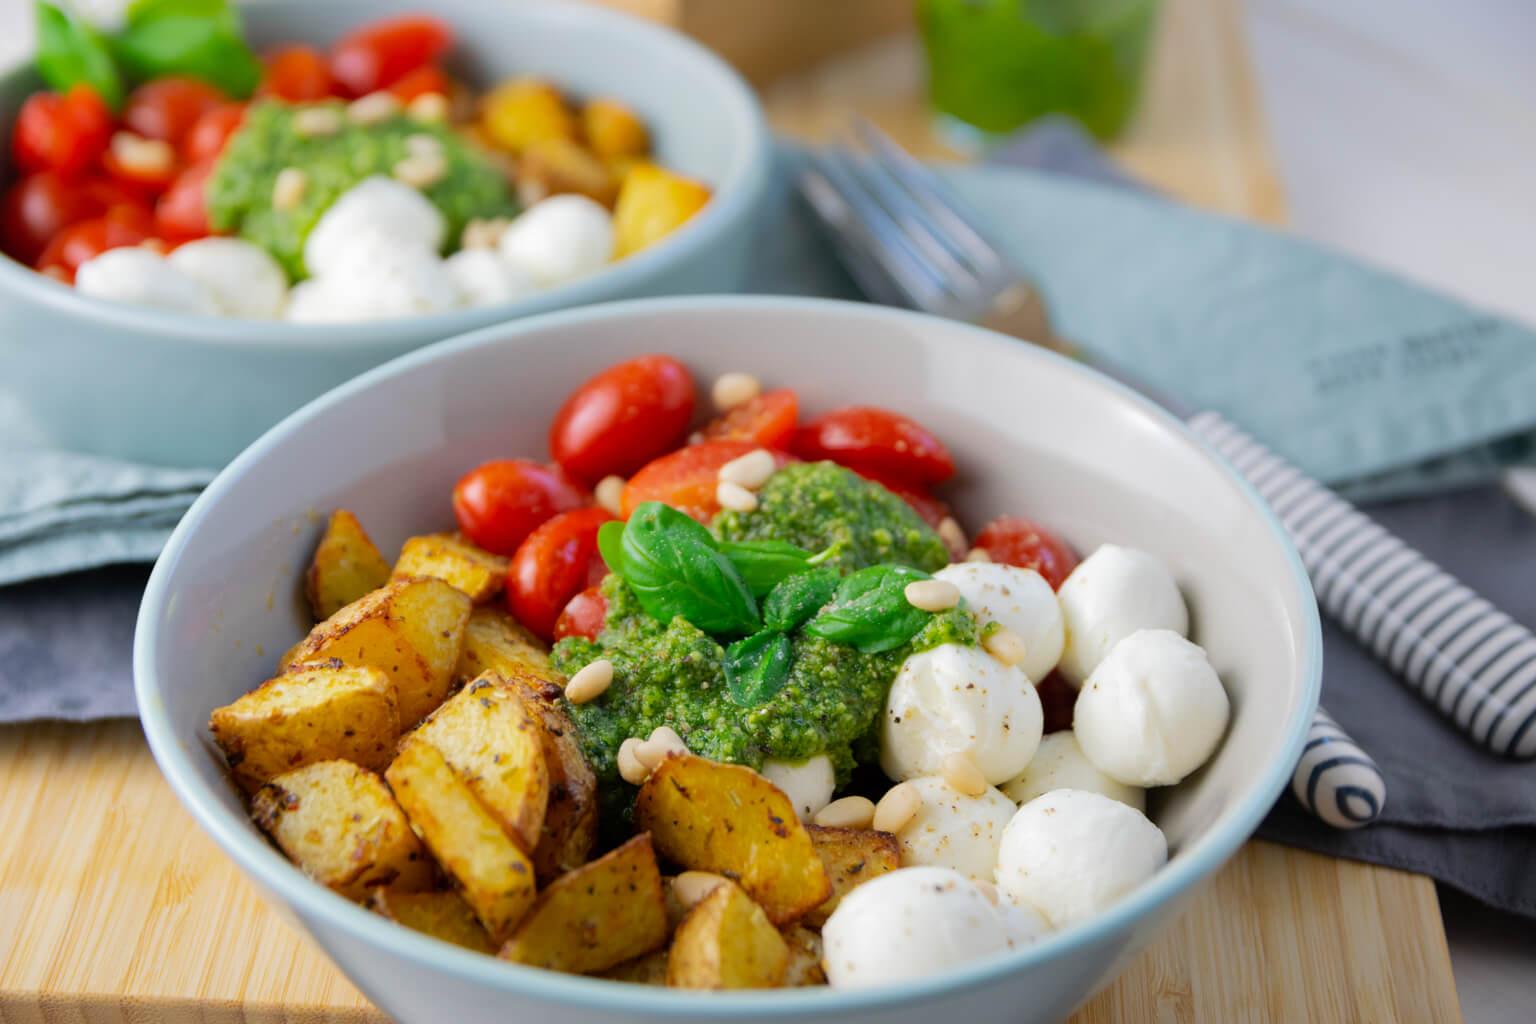 Köstlicher lauwarmer Kartoffelsalat - Pesto Potatoe Bowl